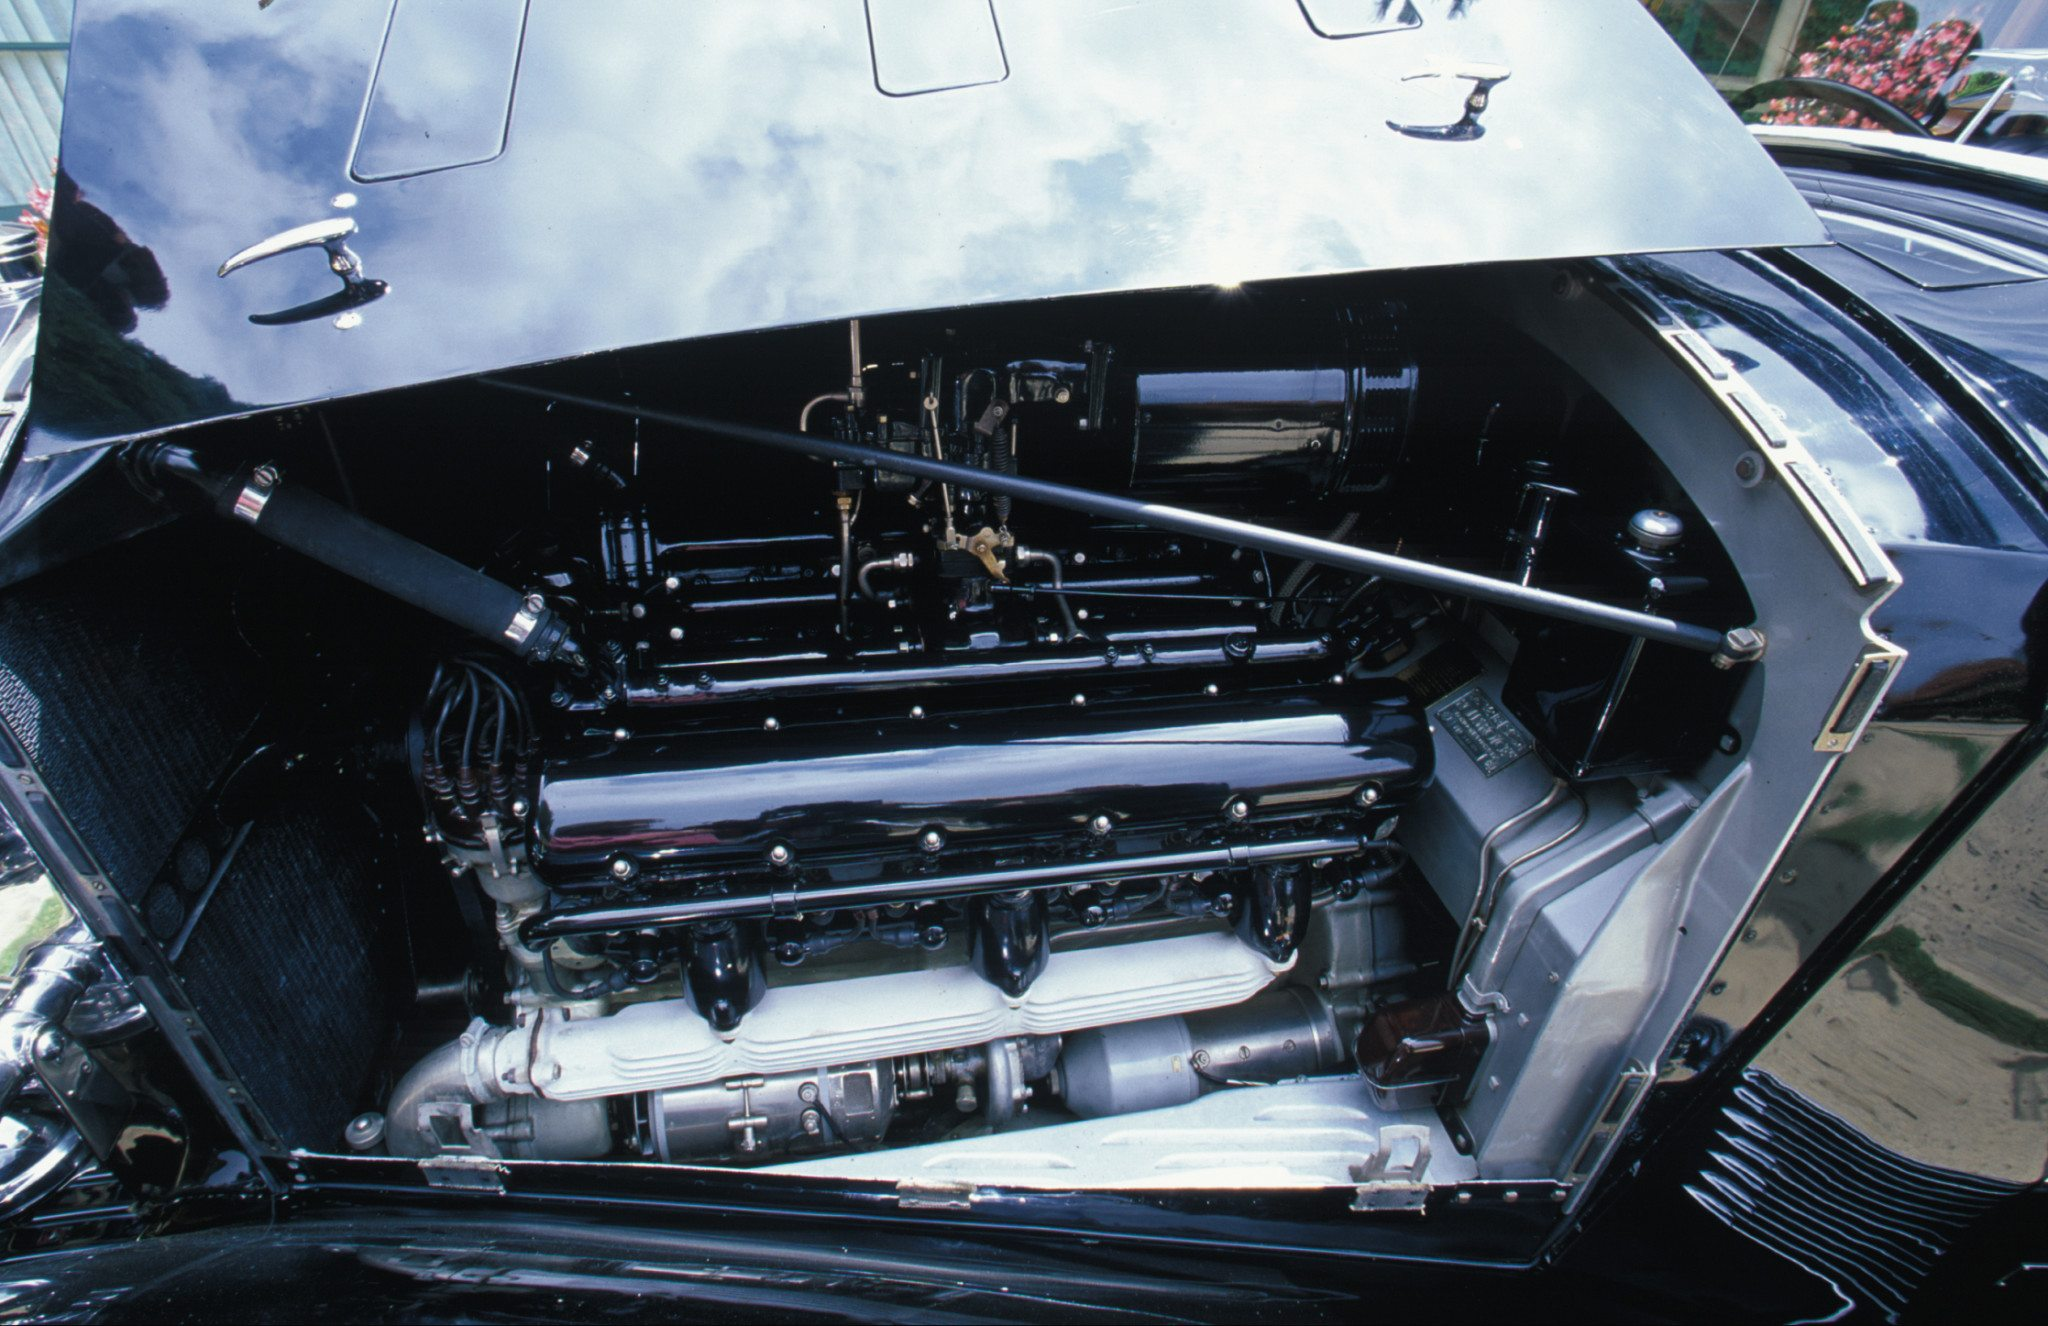 1937 Rolls-Royce Brewster-bodied Sedanca De Ville V12 Engine